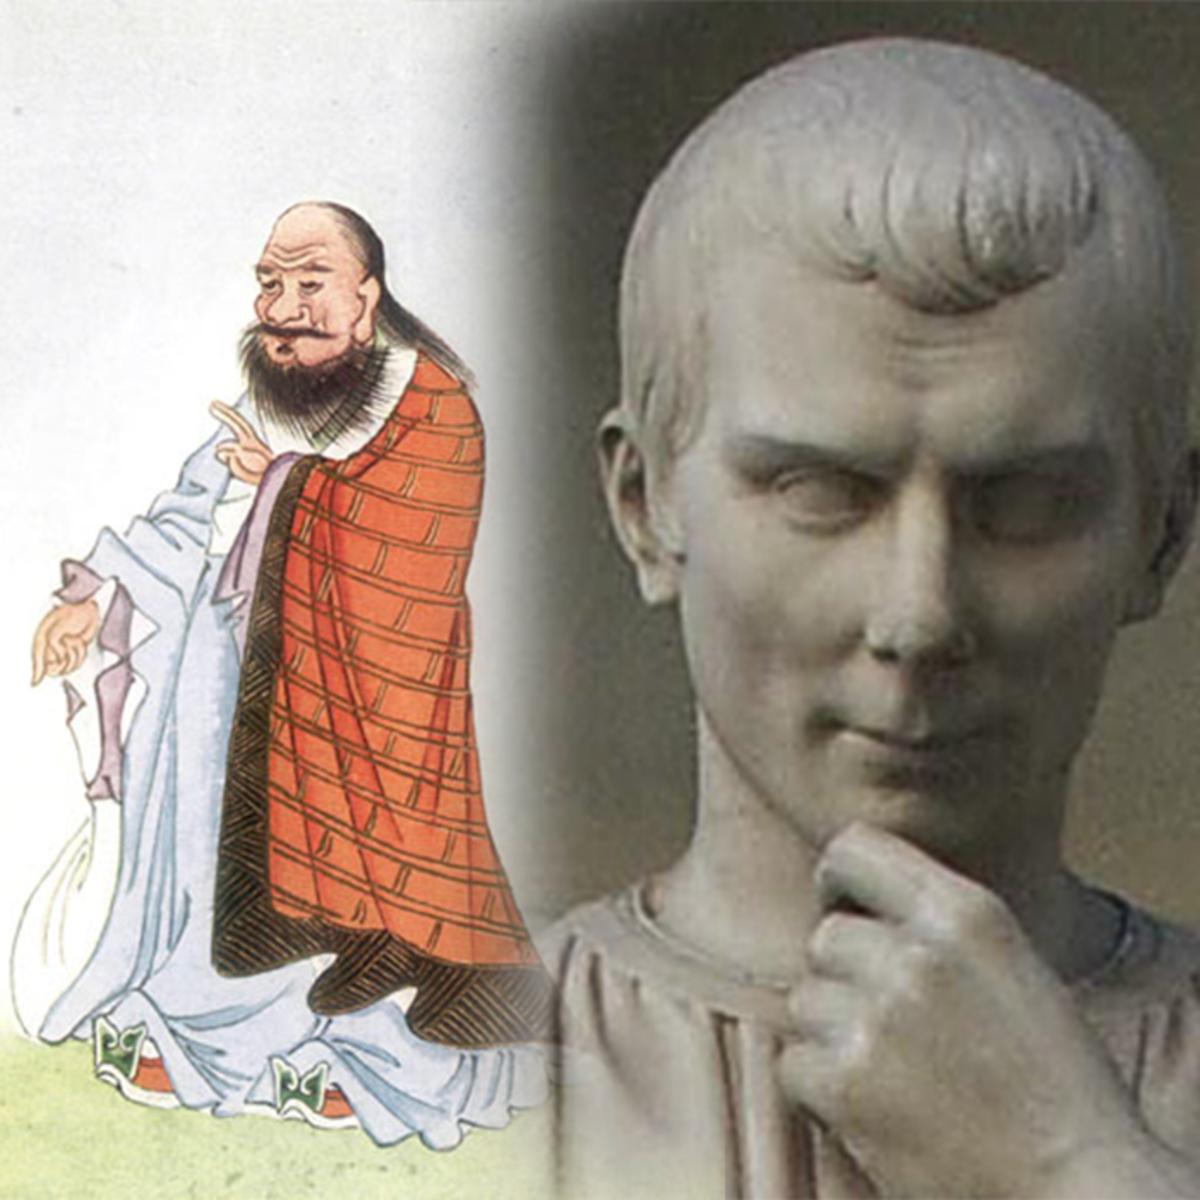 Lao-Tzu Vs. Machiavelli: What Makes a Great Leader?